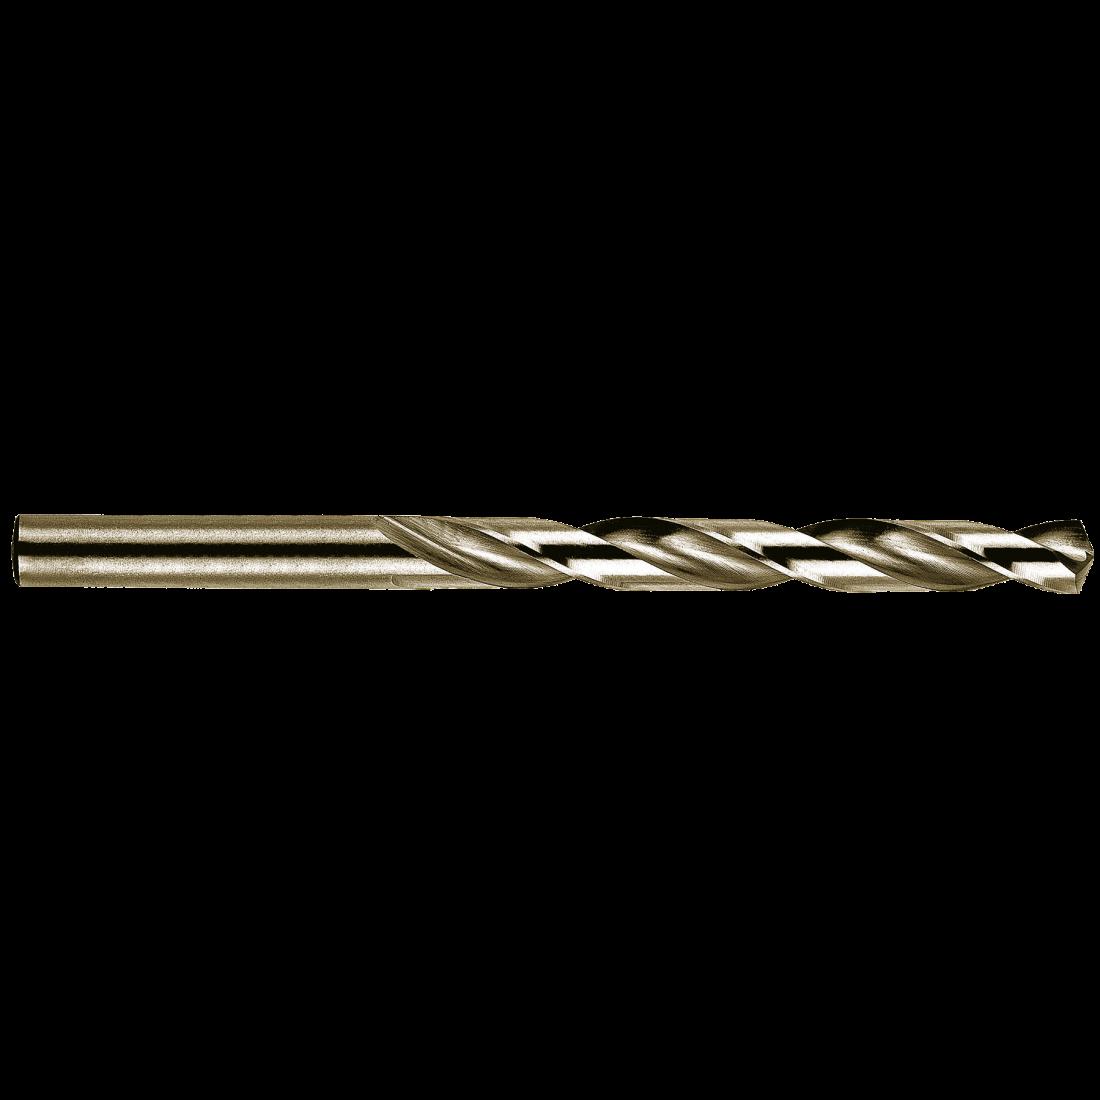 Сверло по металлу Heller НSS-Co DIN 338 RN  2,2x27x53мм (10шт)